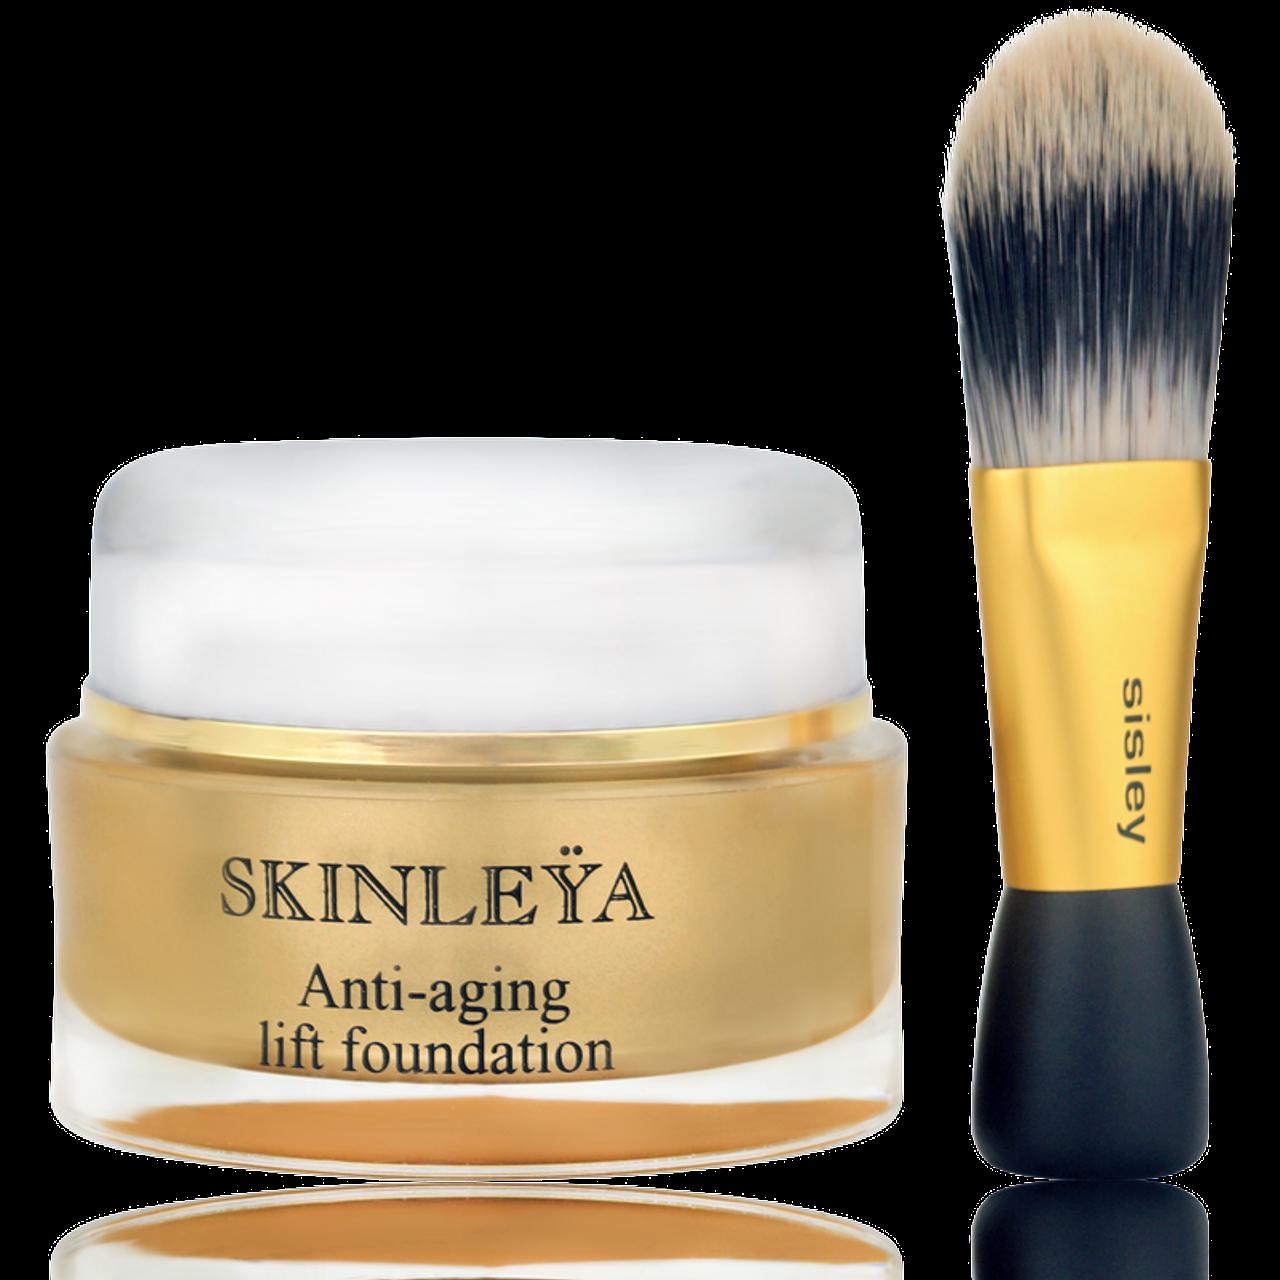 Sisley Skinleya Anti-Aging Foundation - 01 Light Opal 30ml